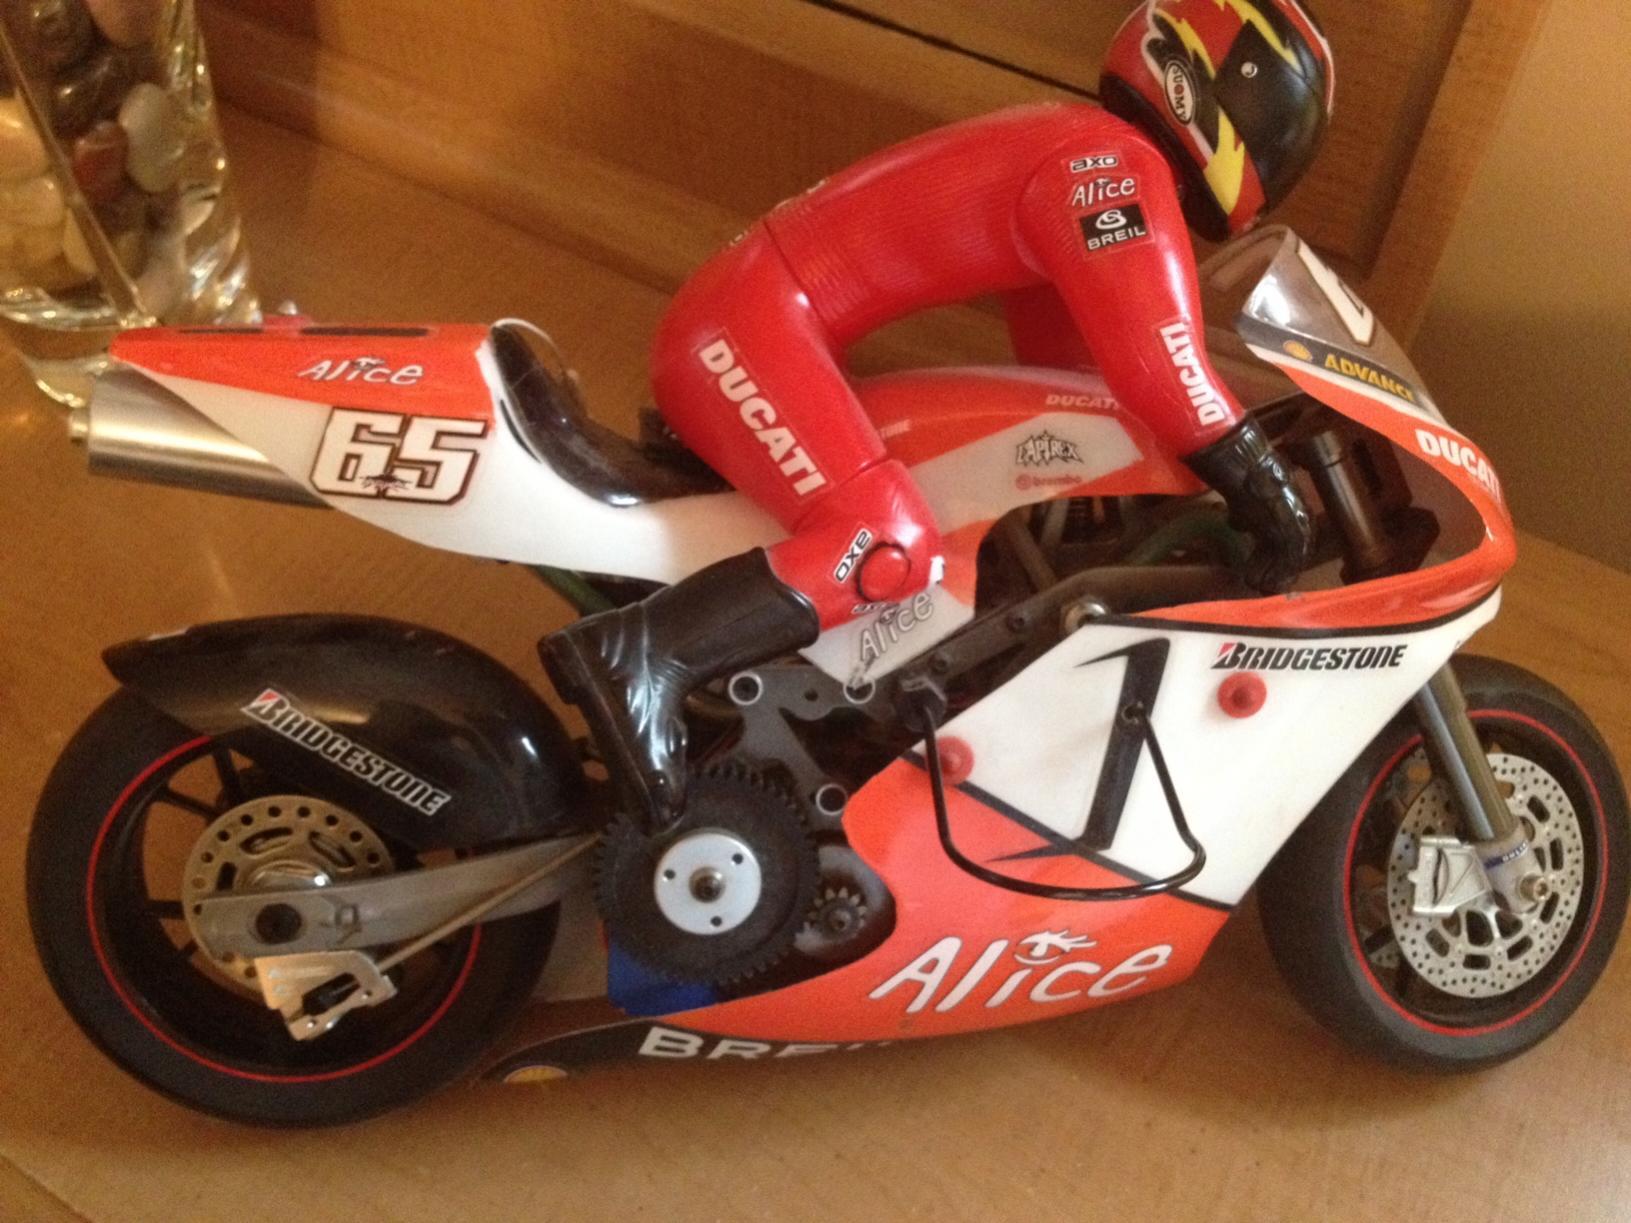 orange/white thunder tiger ducati 999r nitro motorcycle - r/c tech